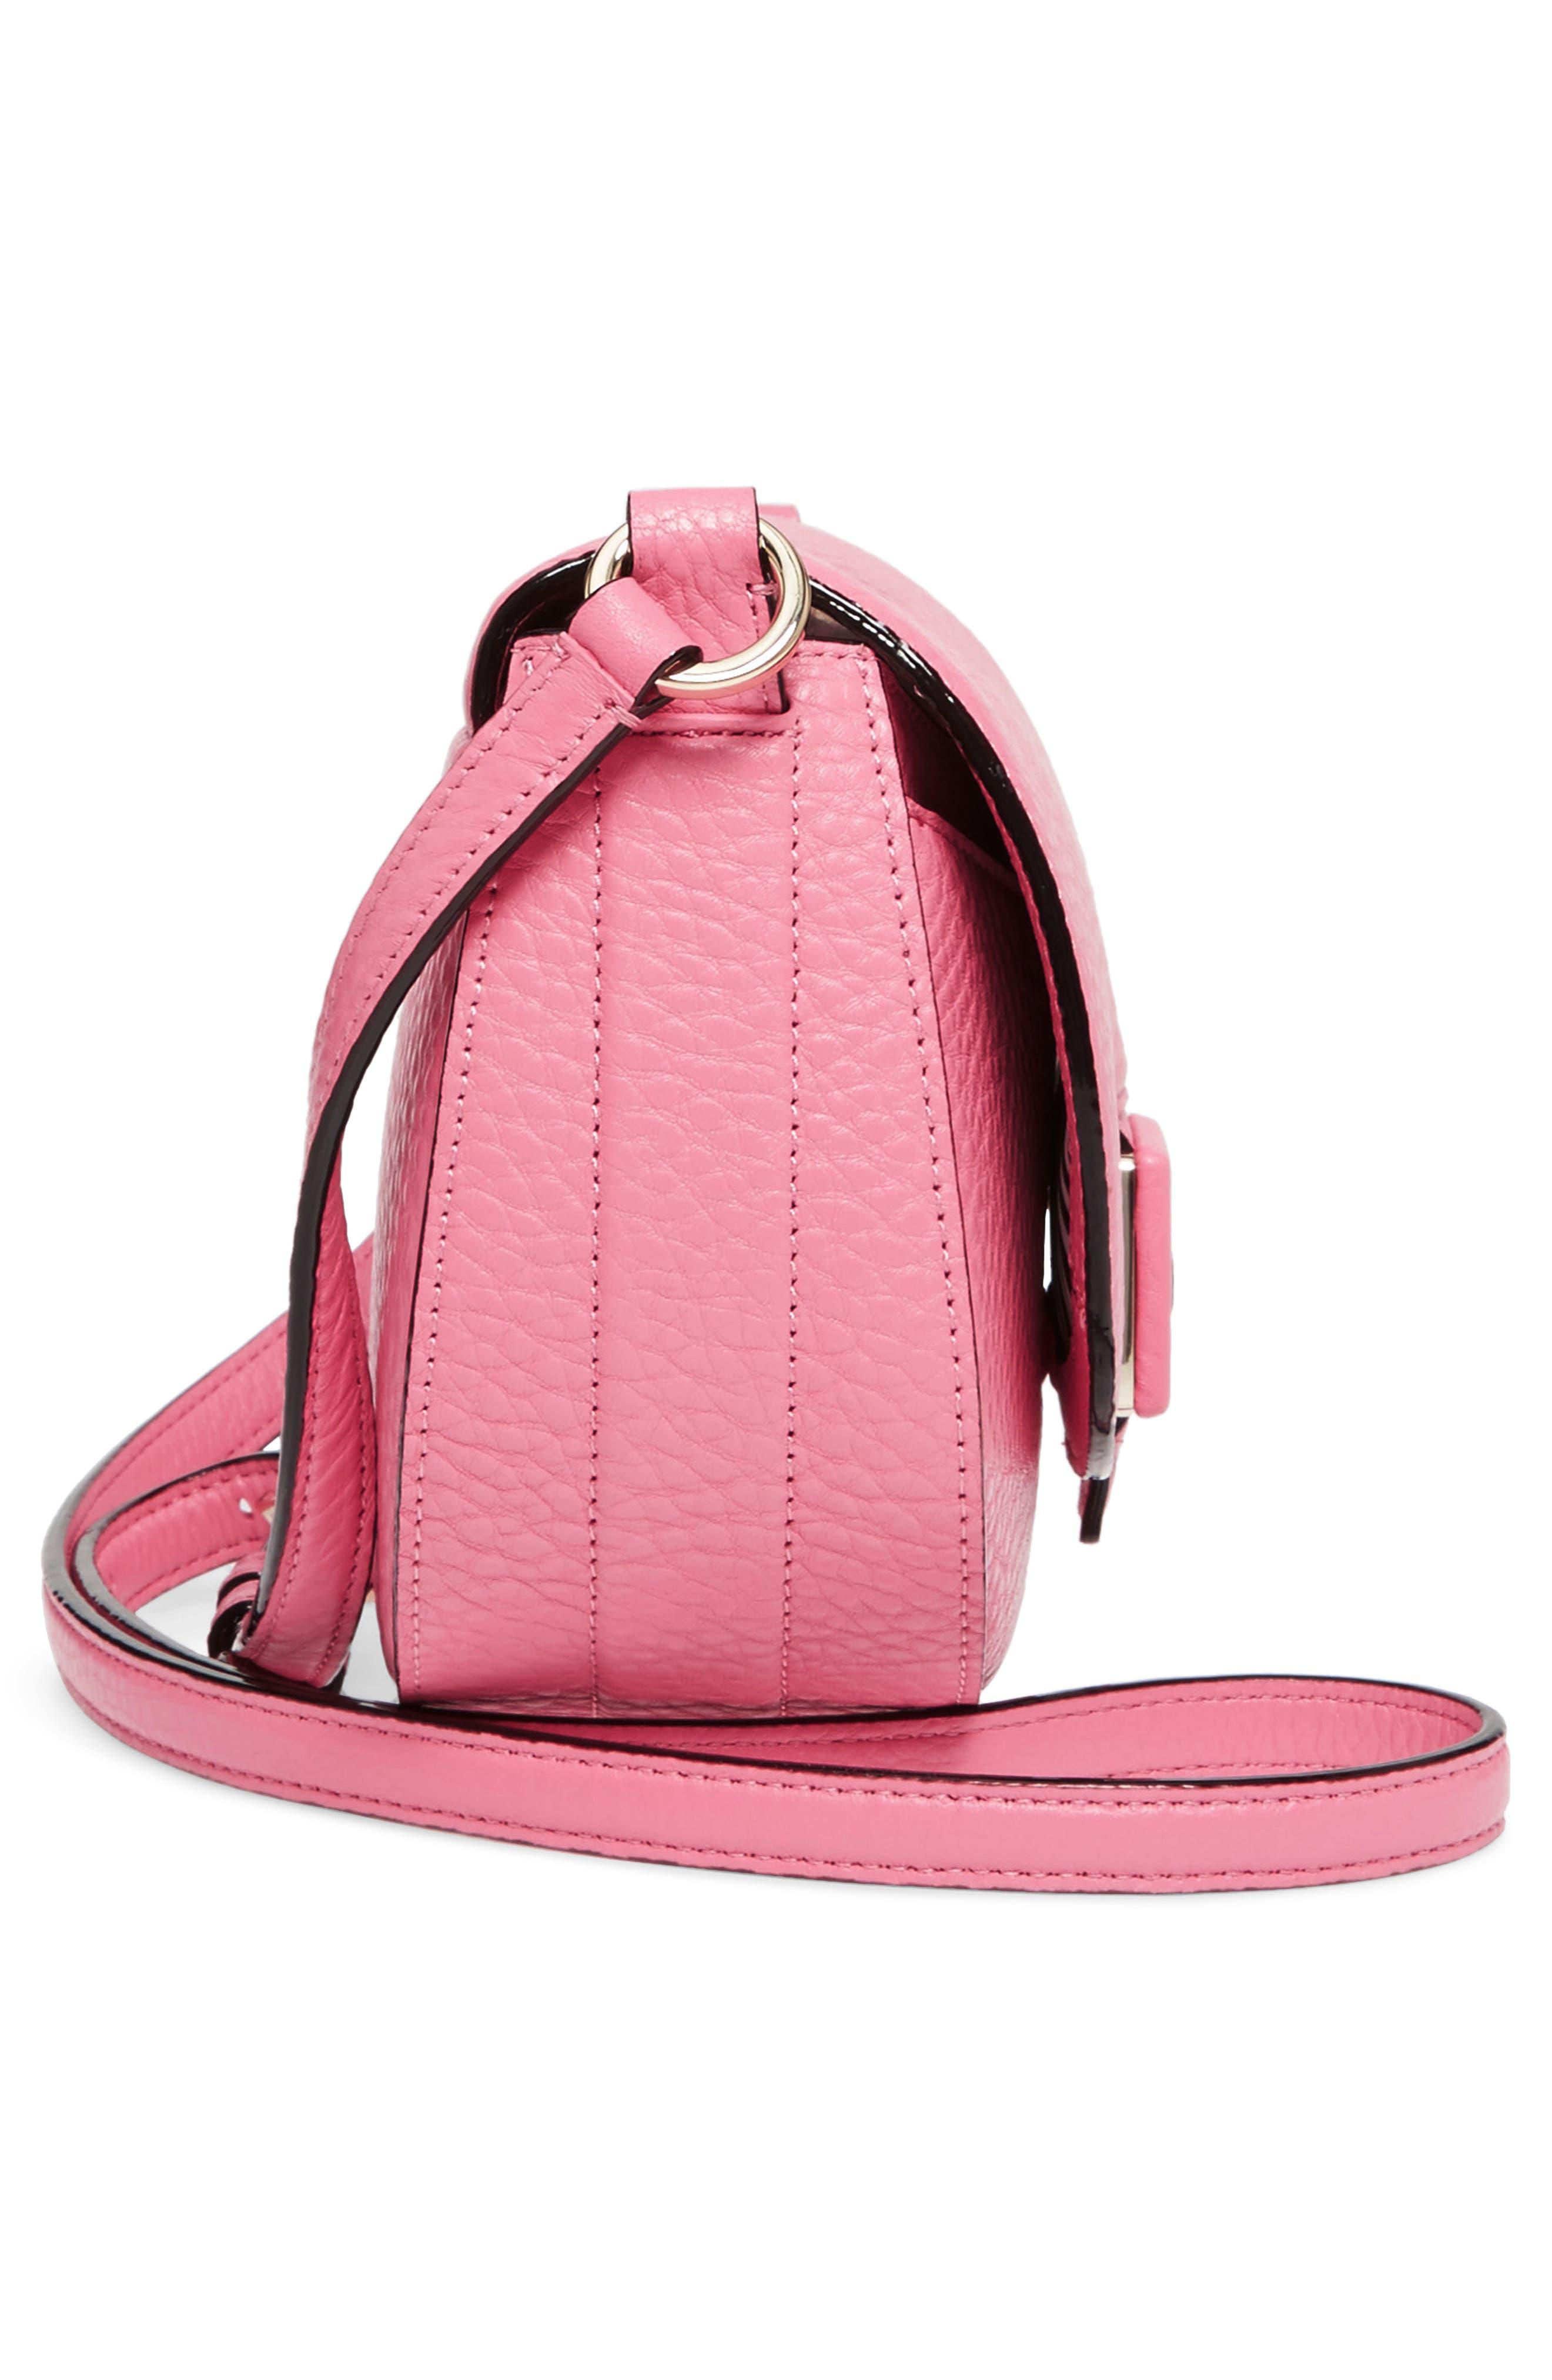 carlyle street - kallie leather saddle bag,                             Alternate thumbnail 15, color,